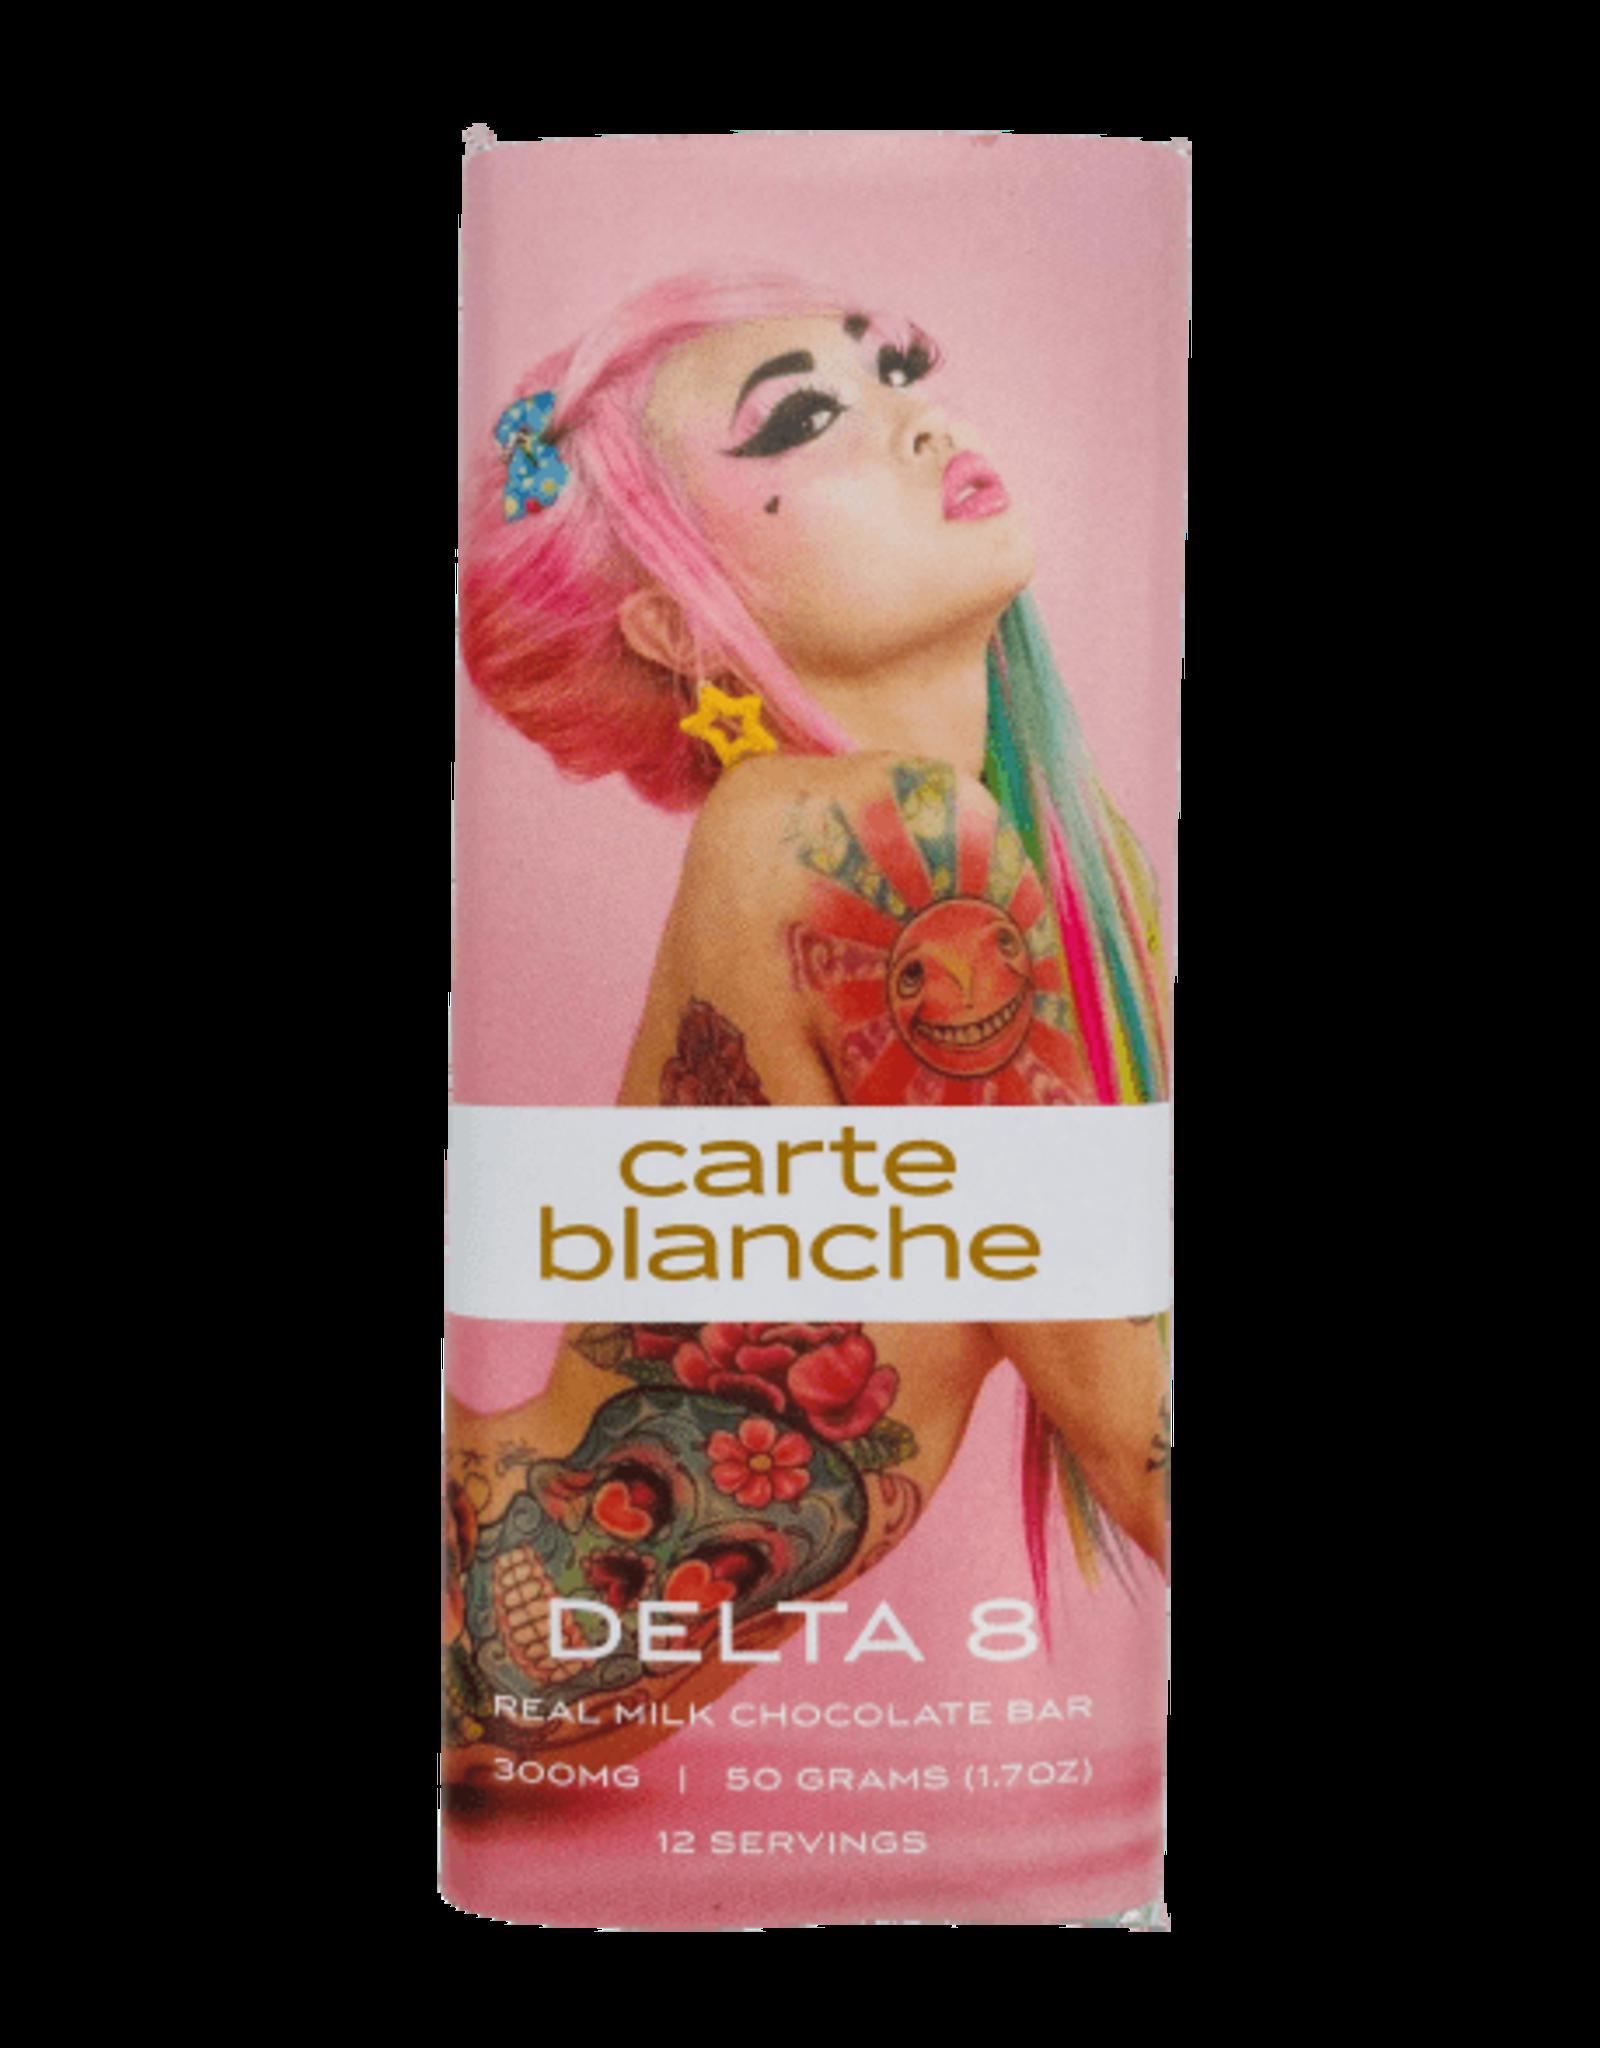 Carte blanche delta 8 chocolate bar 300mg